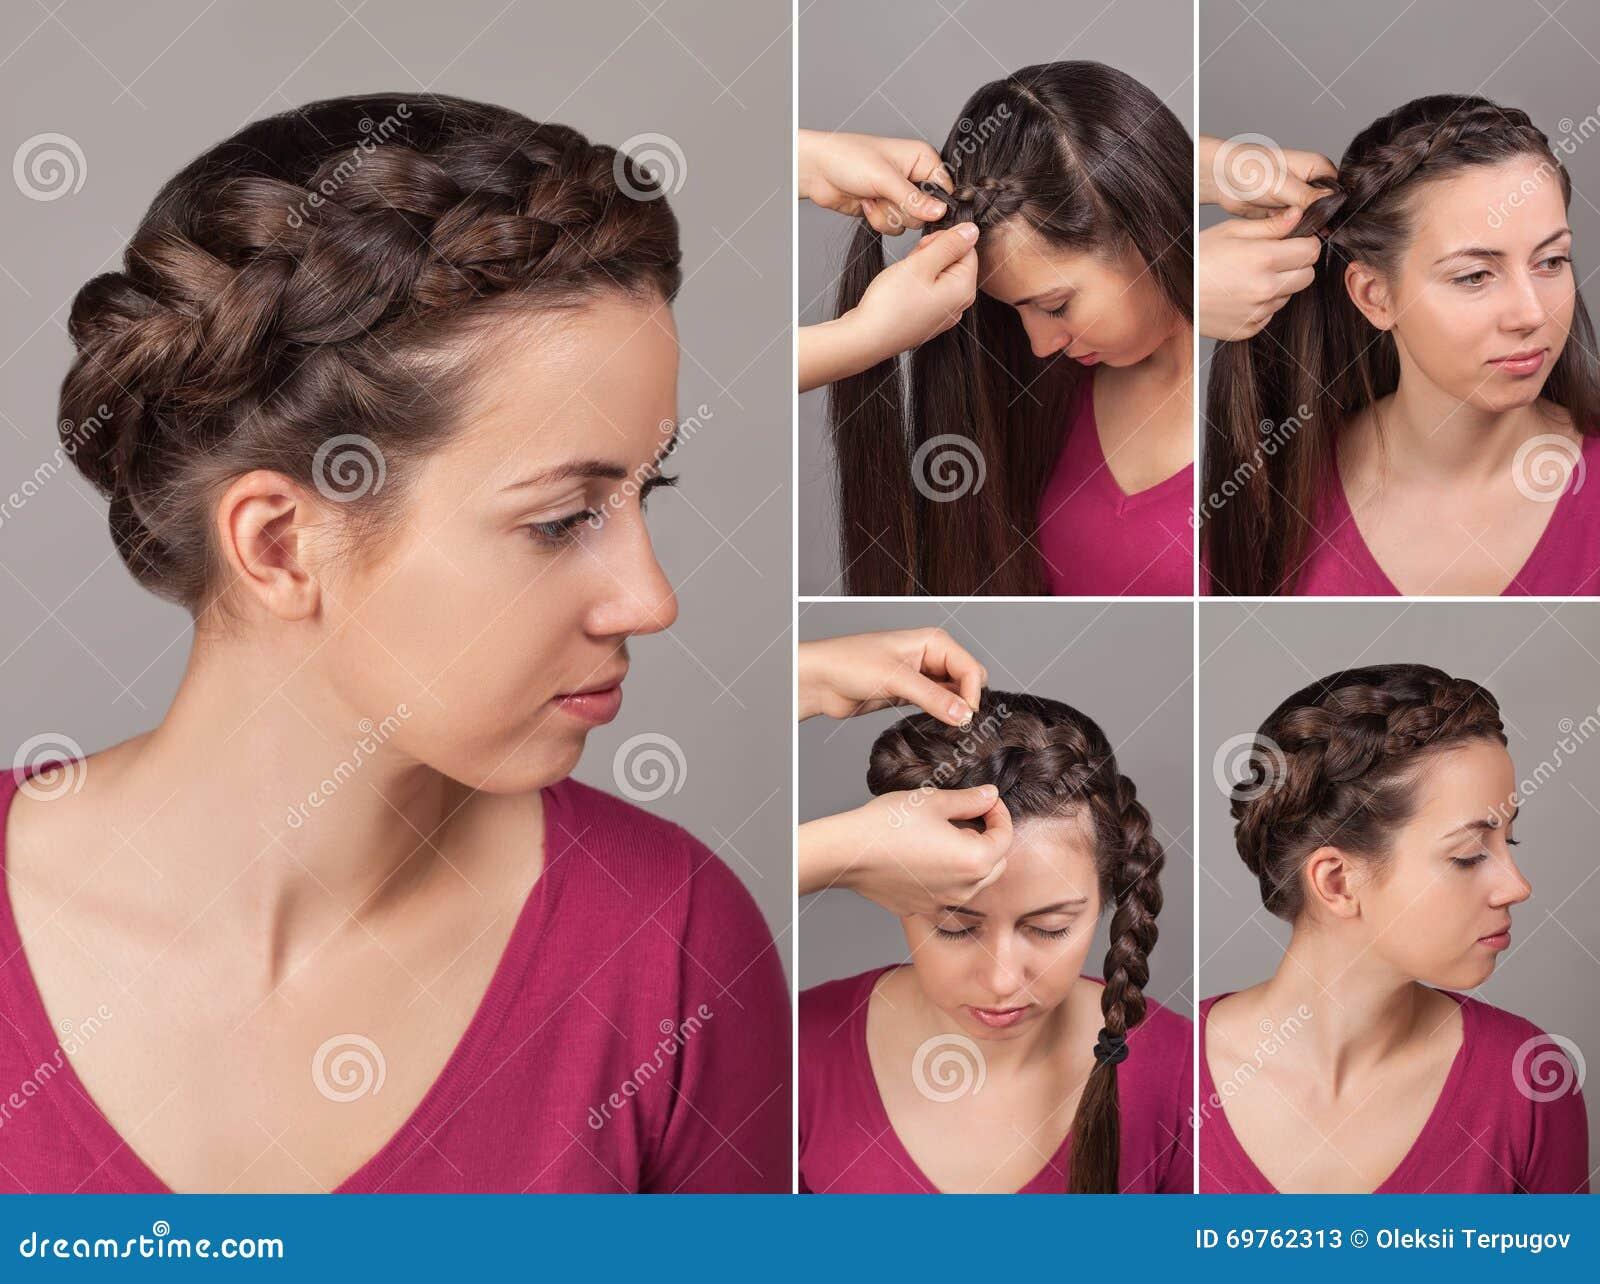 Simple braid hairstyle tutorial stock image image of fashion simple braid hairstyle tutorial baditri Choice Image